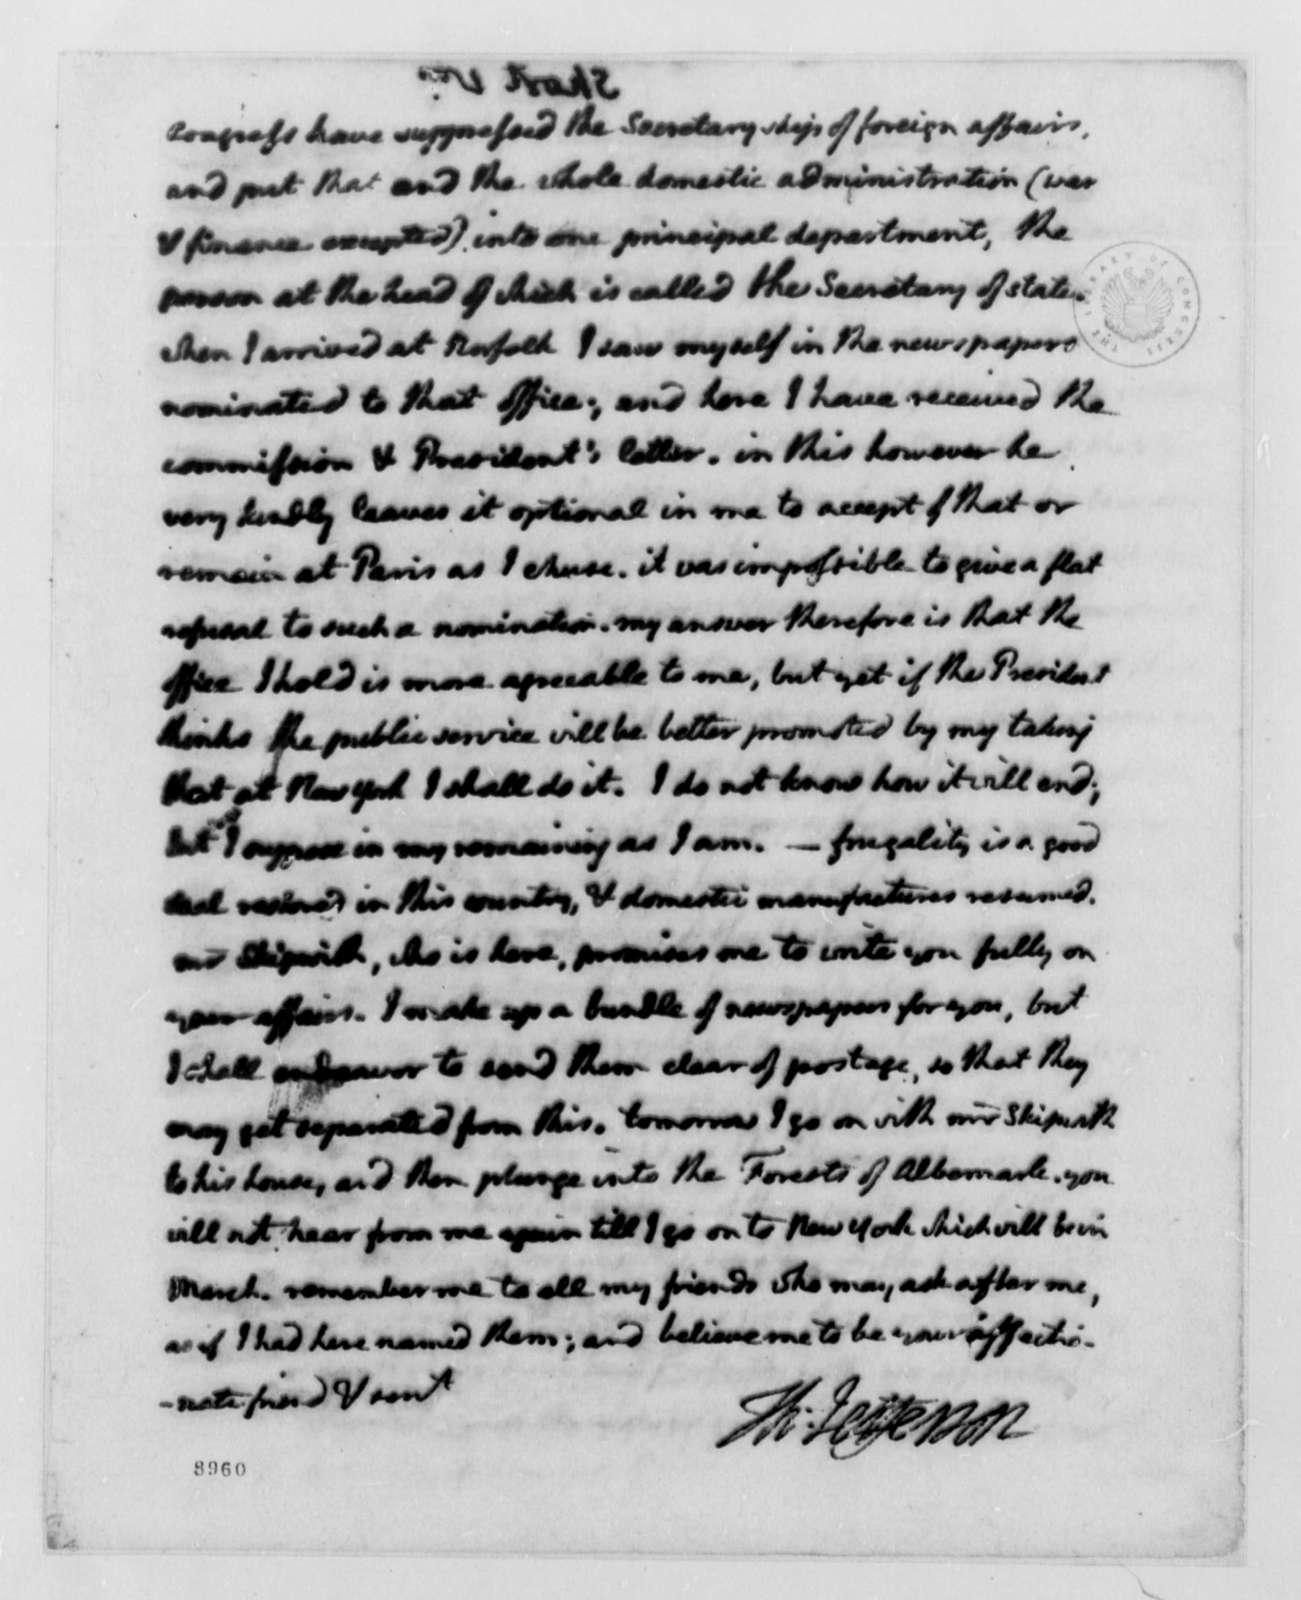 Thomas Jefferson to William Short, December 14, 1789